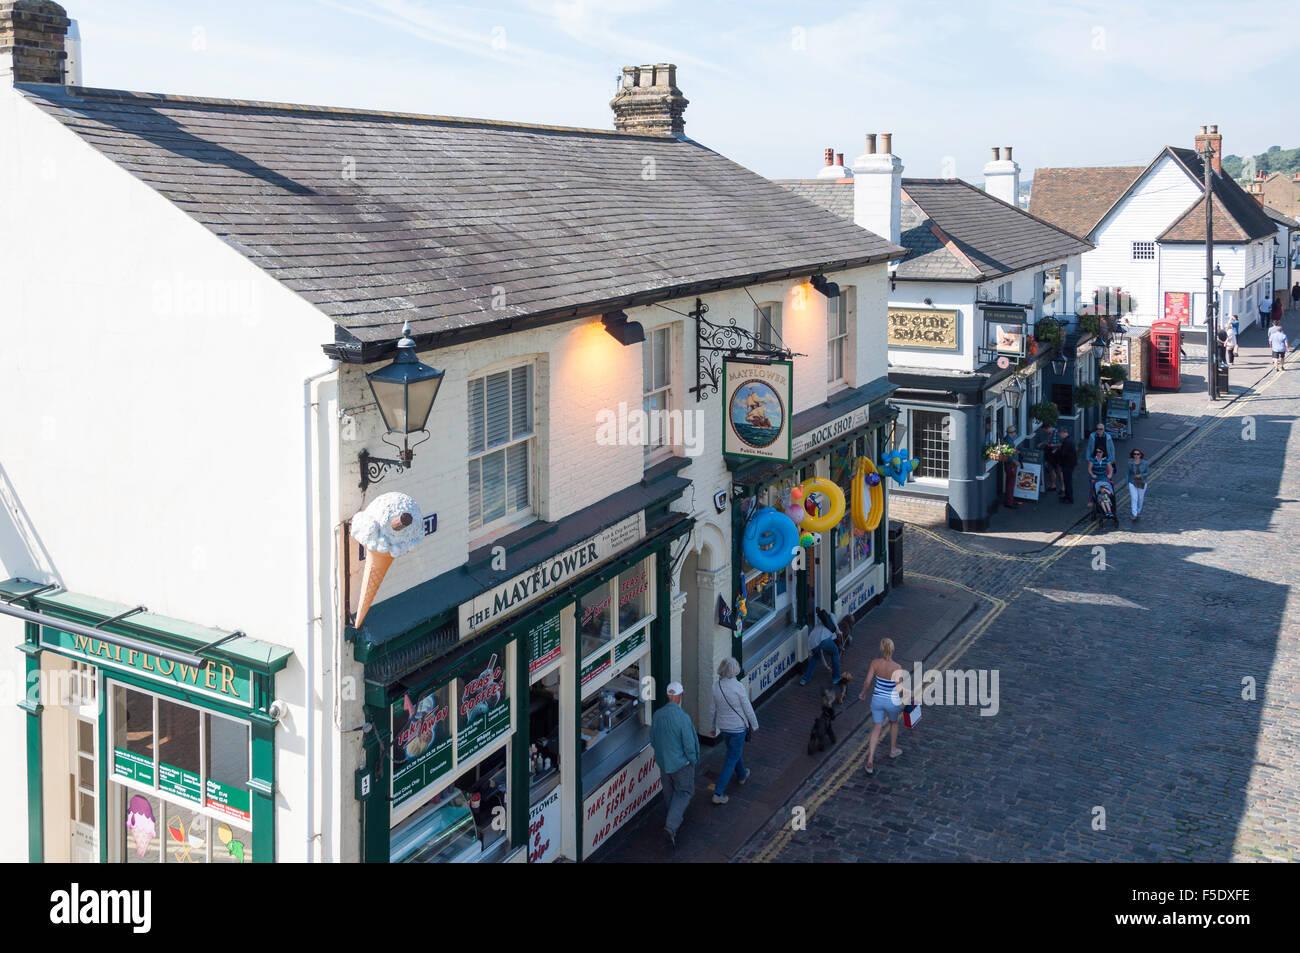 The Mayflower Pub, High Street, Old Leigh, Leigh-on-Sea, Essex, England, United Kingdom Stock Photo